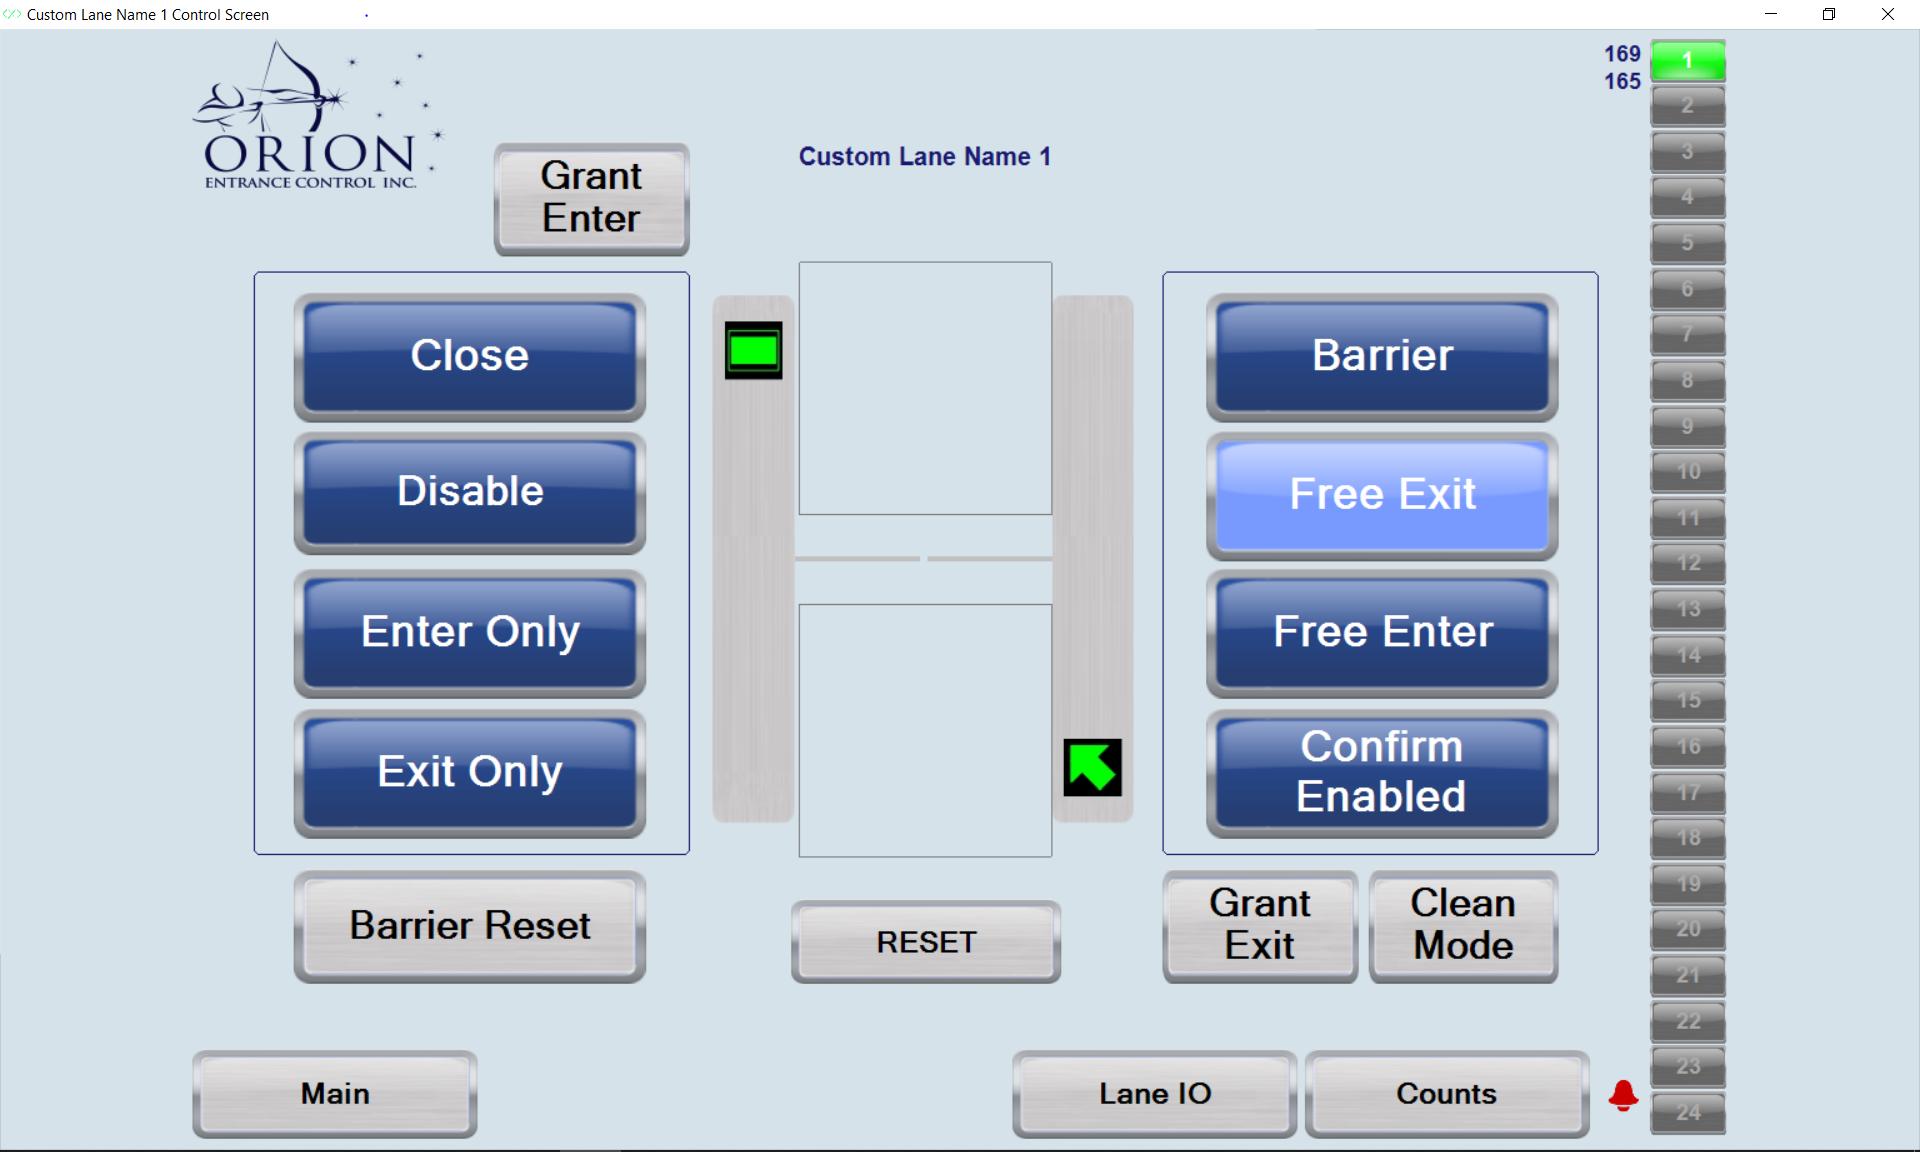 Lane Control Screen